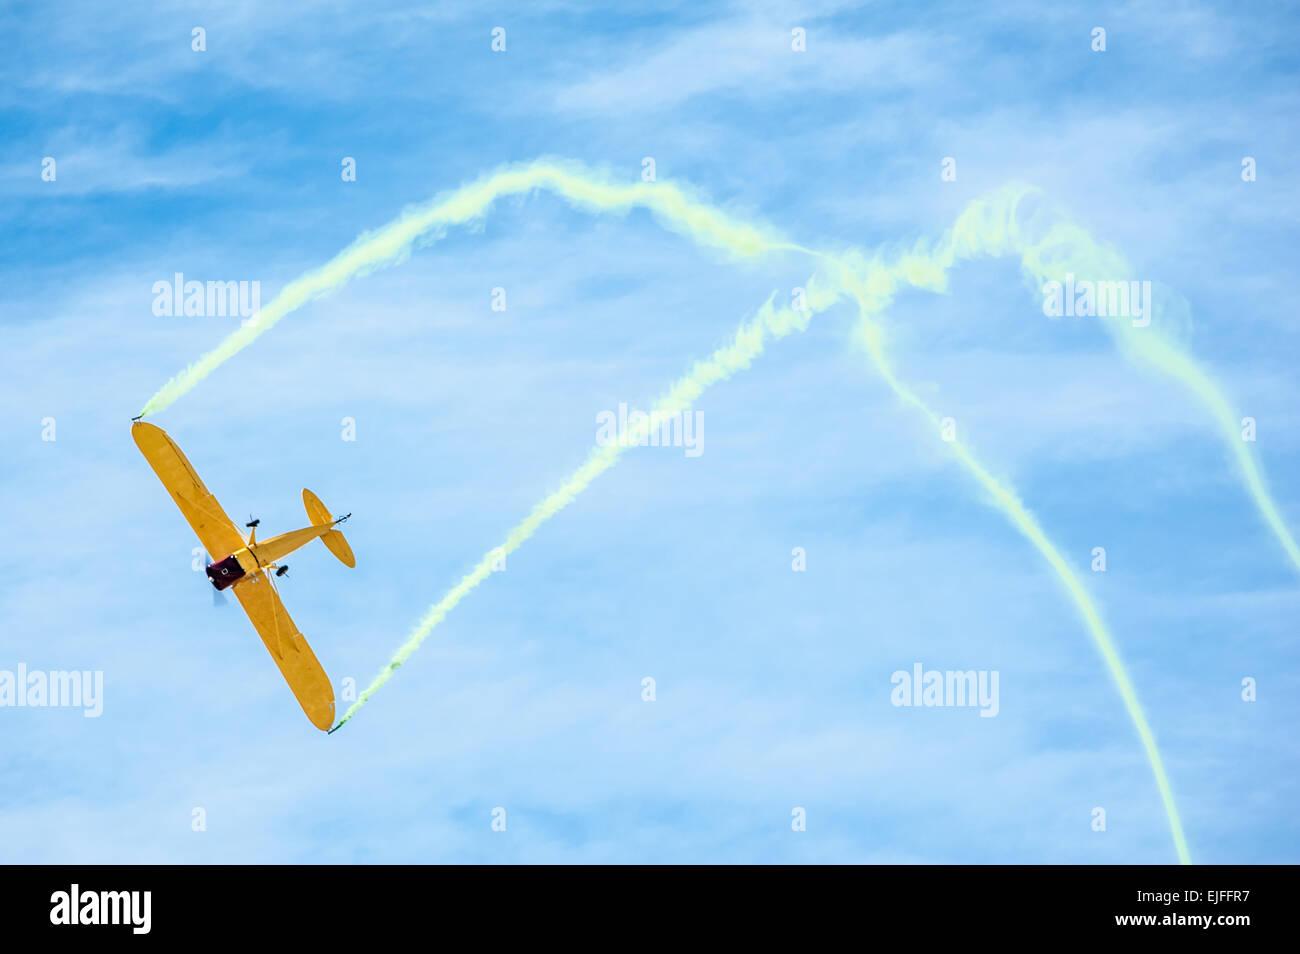 Aerobatic plane with colored smoke trails. - Stock Image